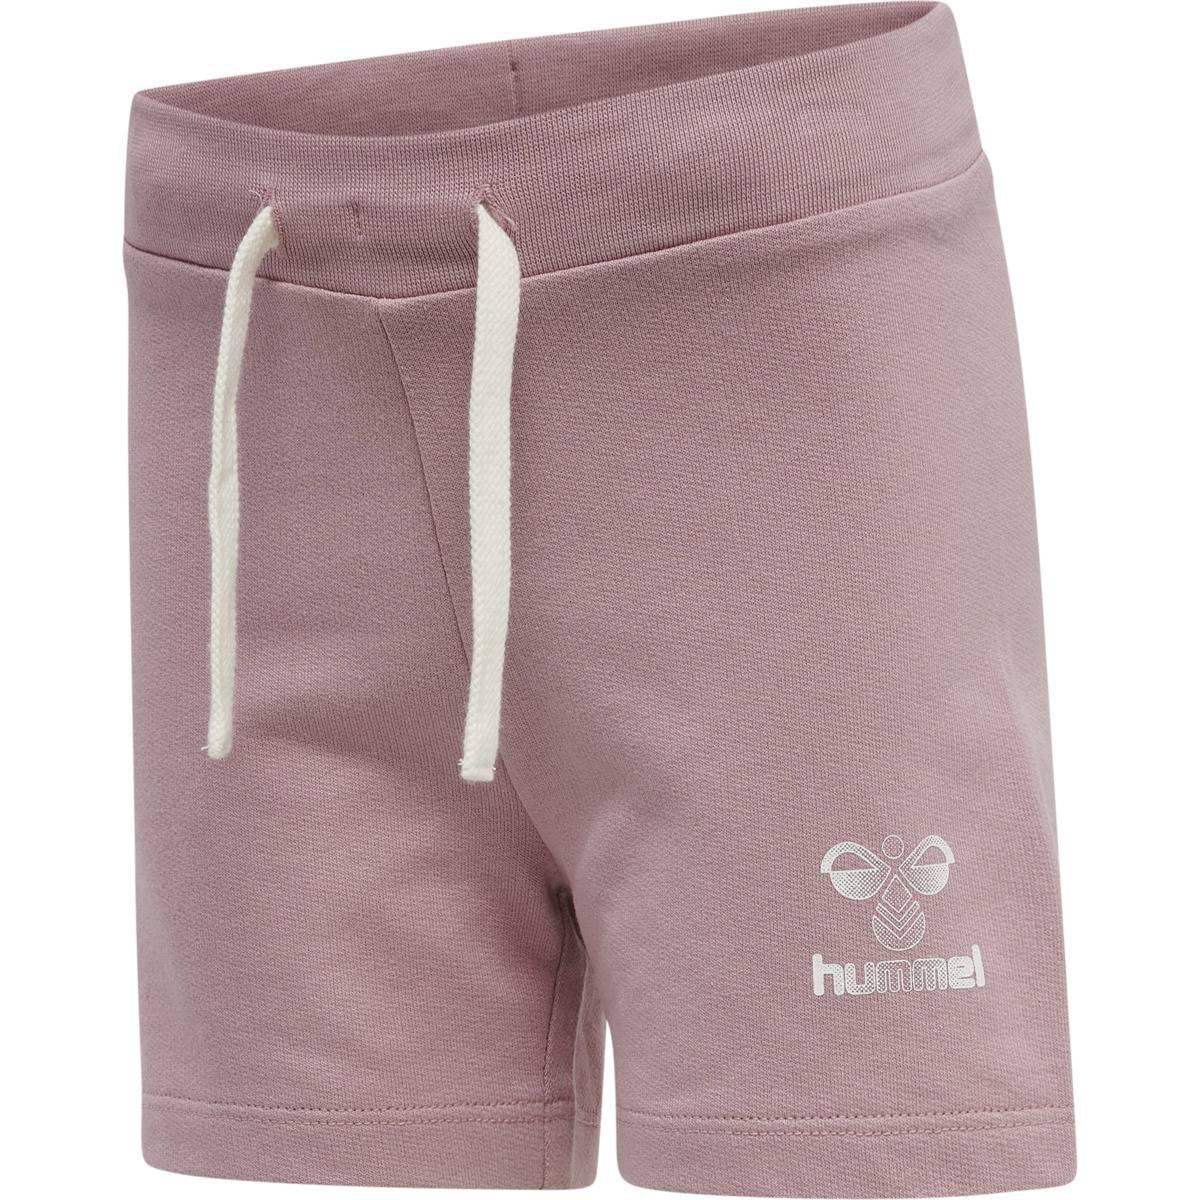 Hummel Proud shorts girl - lilas